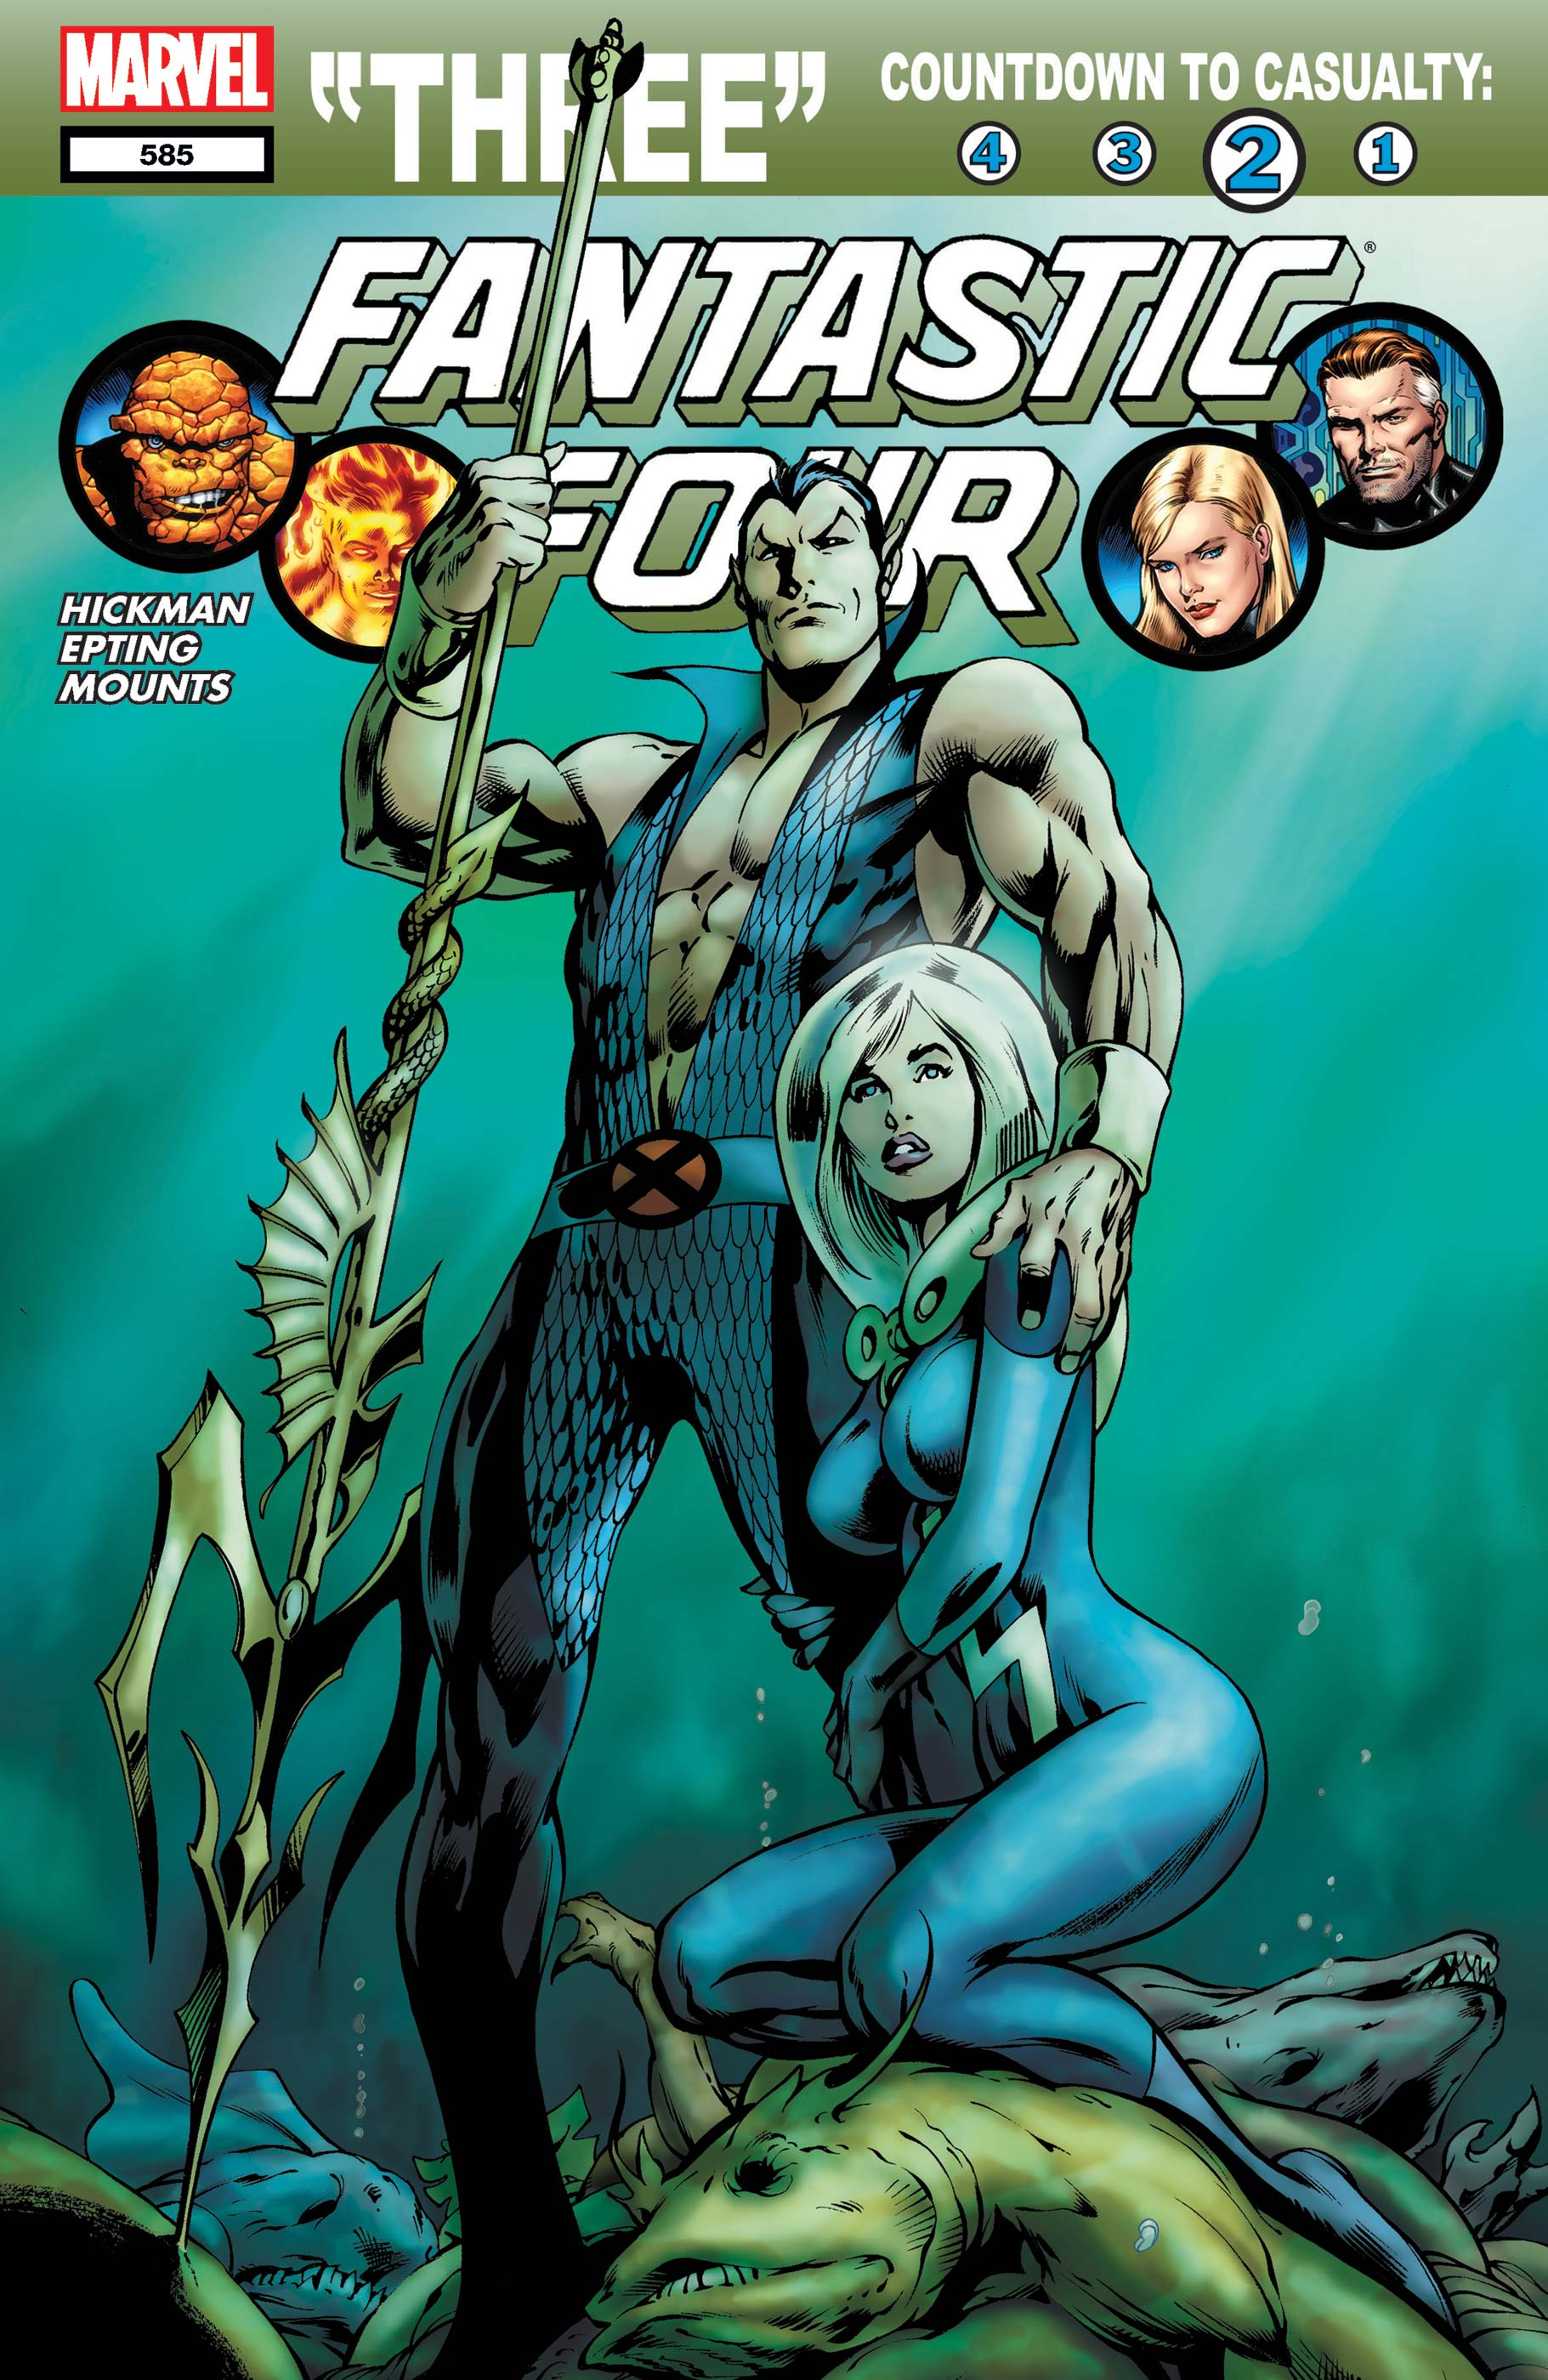 Fantastic Four (1998) #585